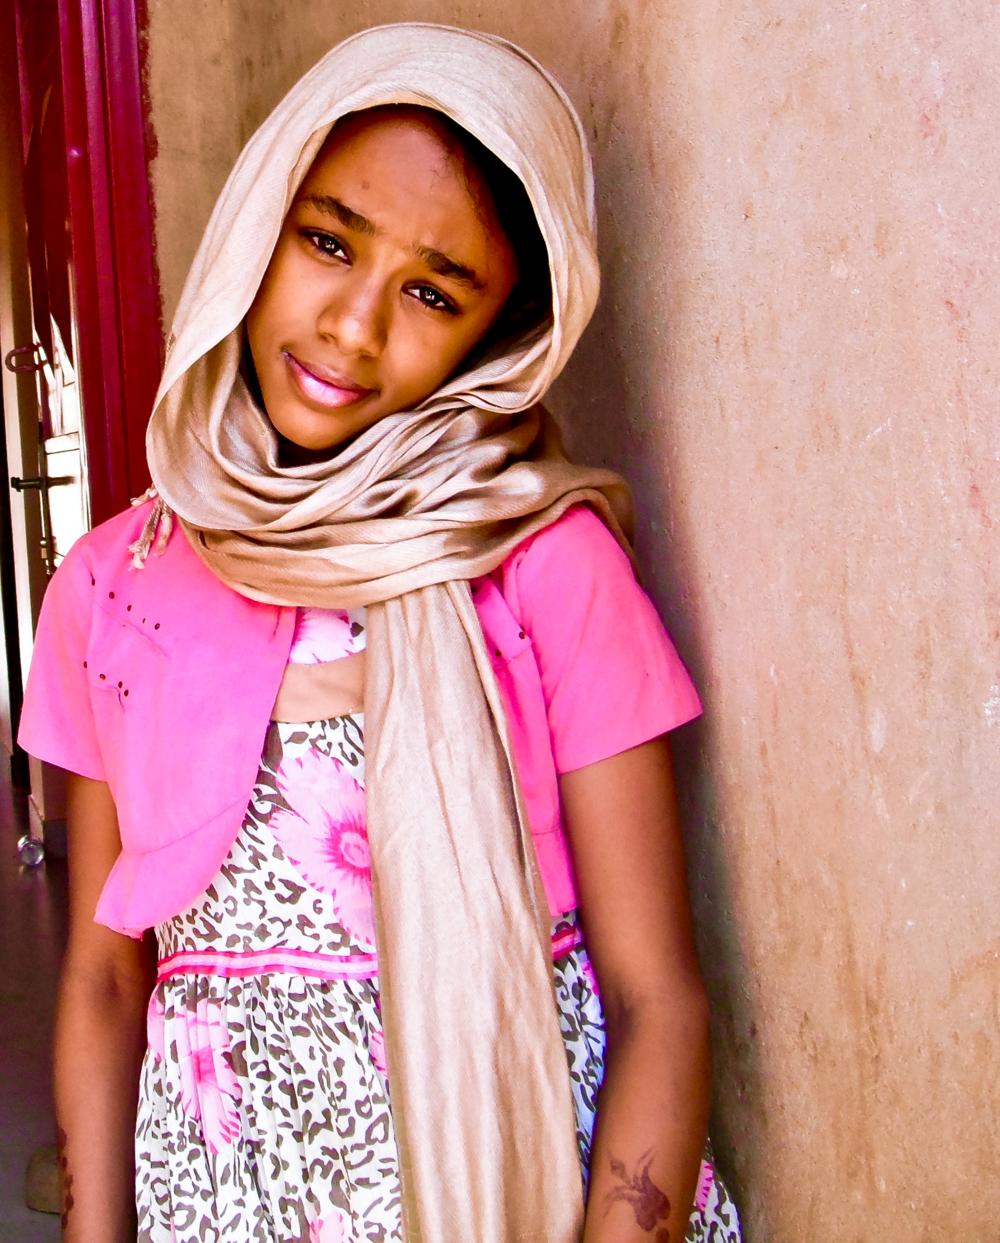 Khartoum, Sudan, 2011